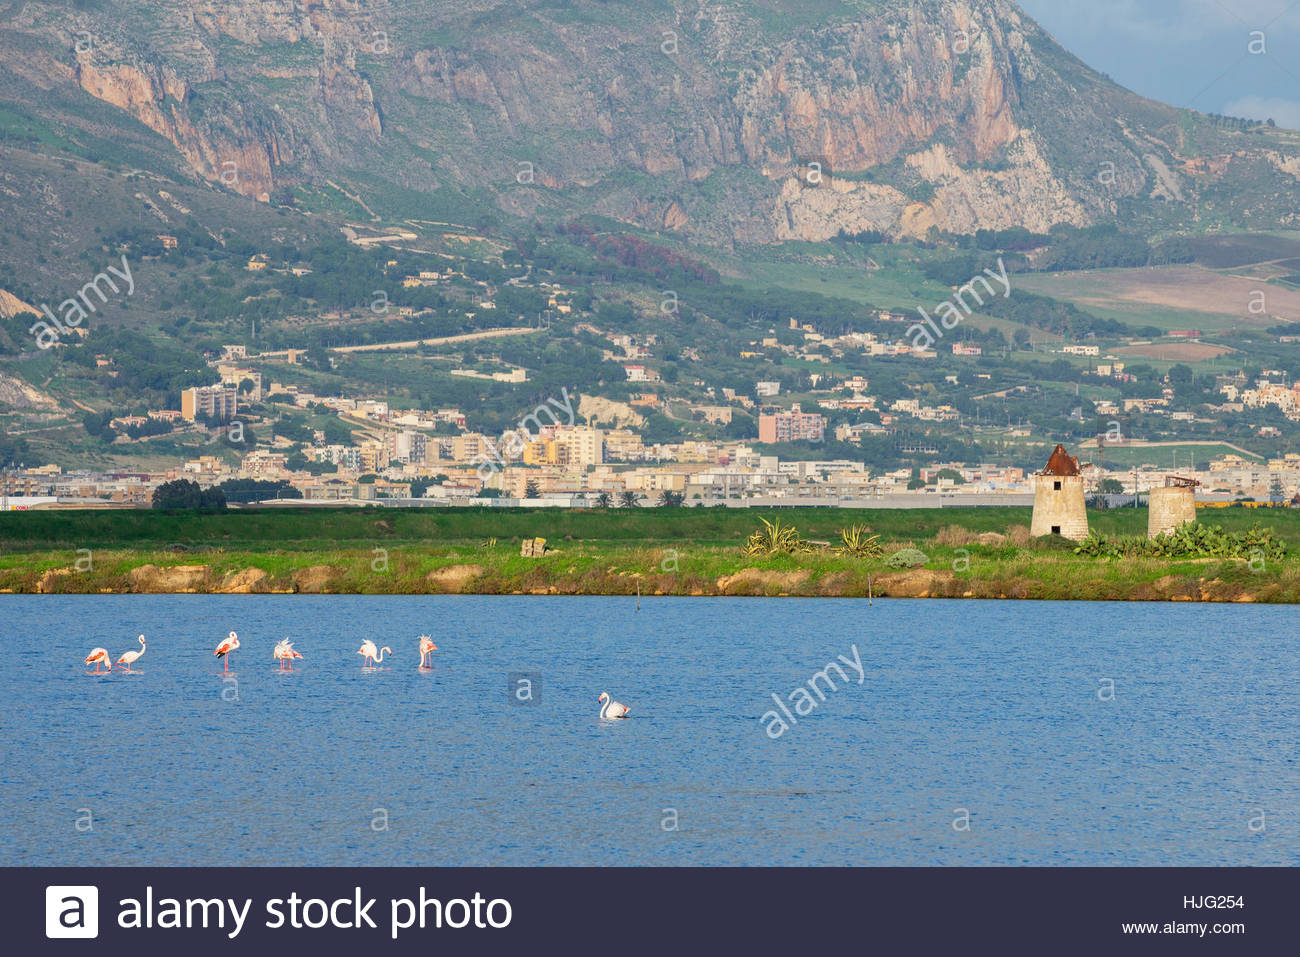 Pink Flamingos at Salt Pans, Trapani, Sicily, Italy. - Stock Image